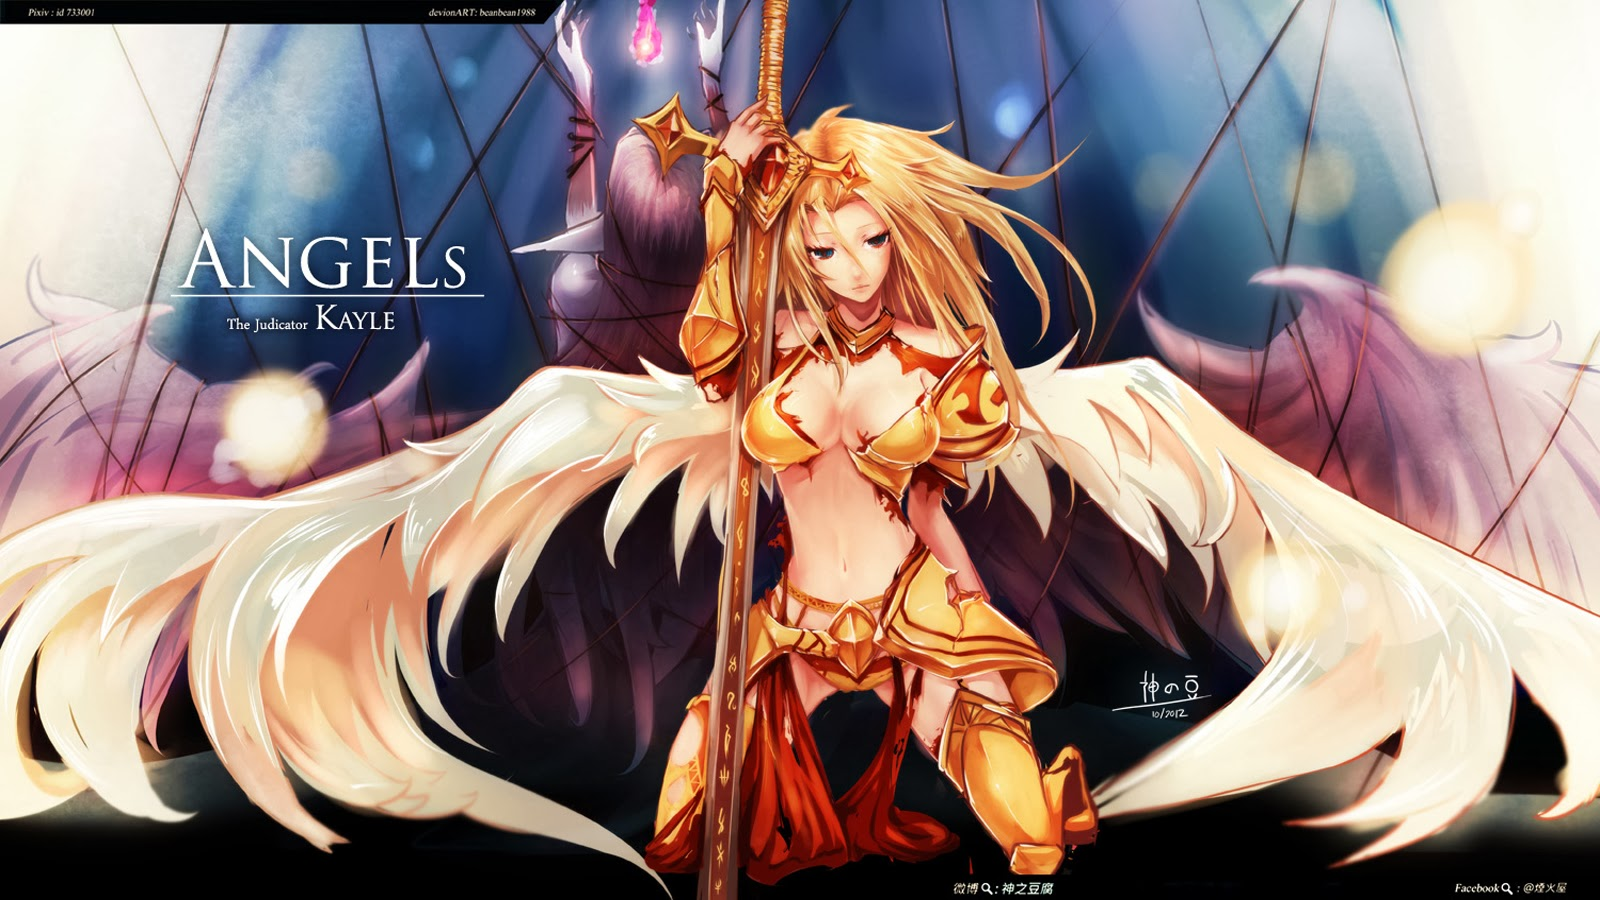 29 League Of Angels Wallpaper Hd On Wallpapersafari